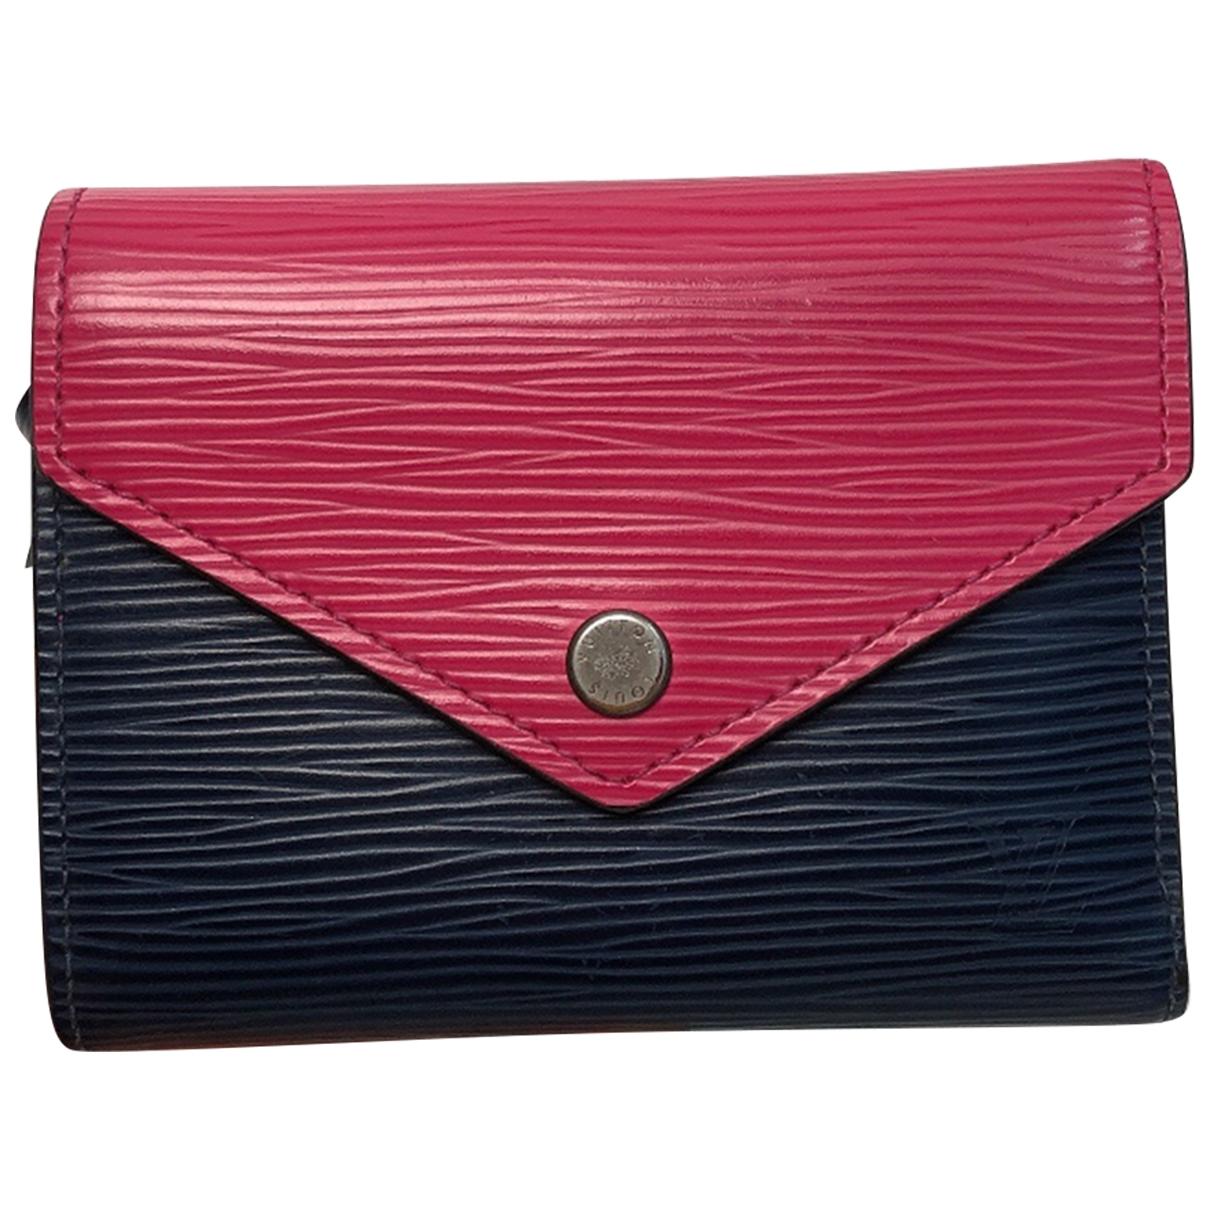 Louis Vuitton Sarah Portemonnaie in  Marine Leder